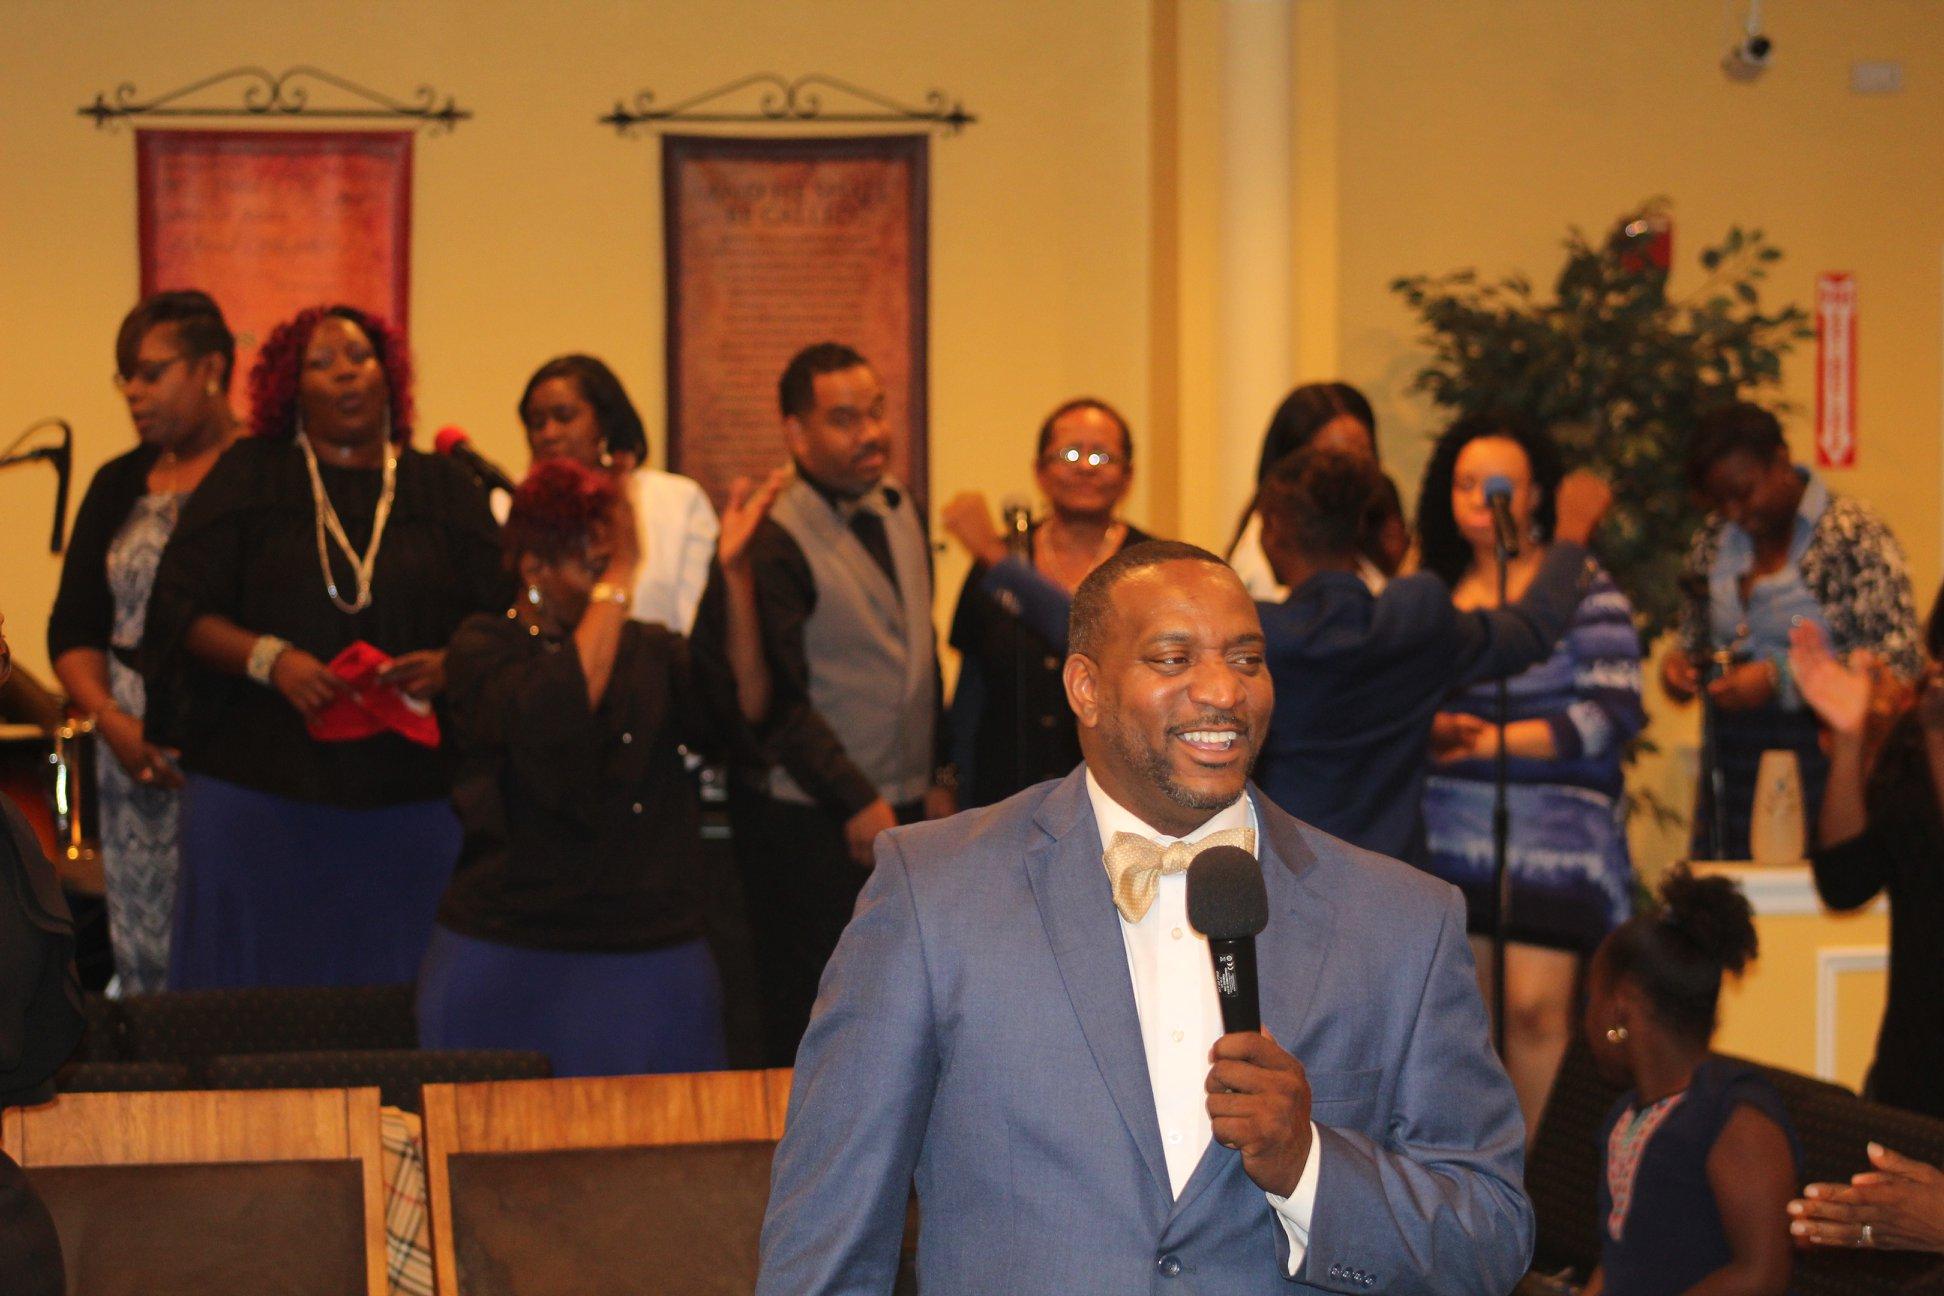 Pastor Shawn Blackwell